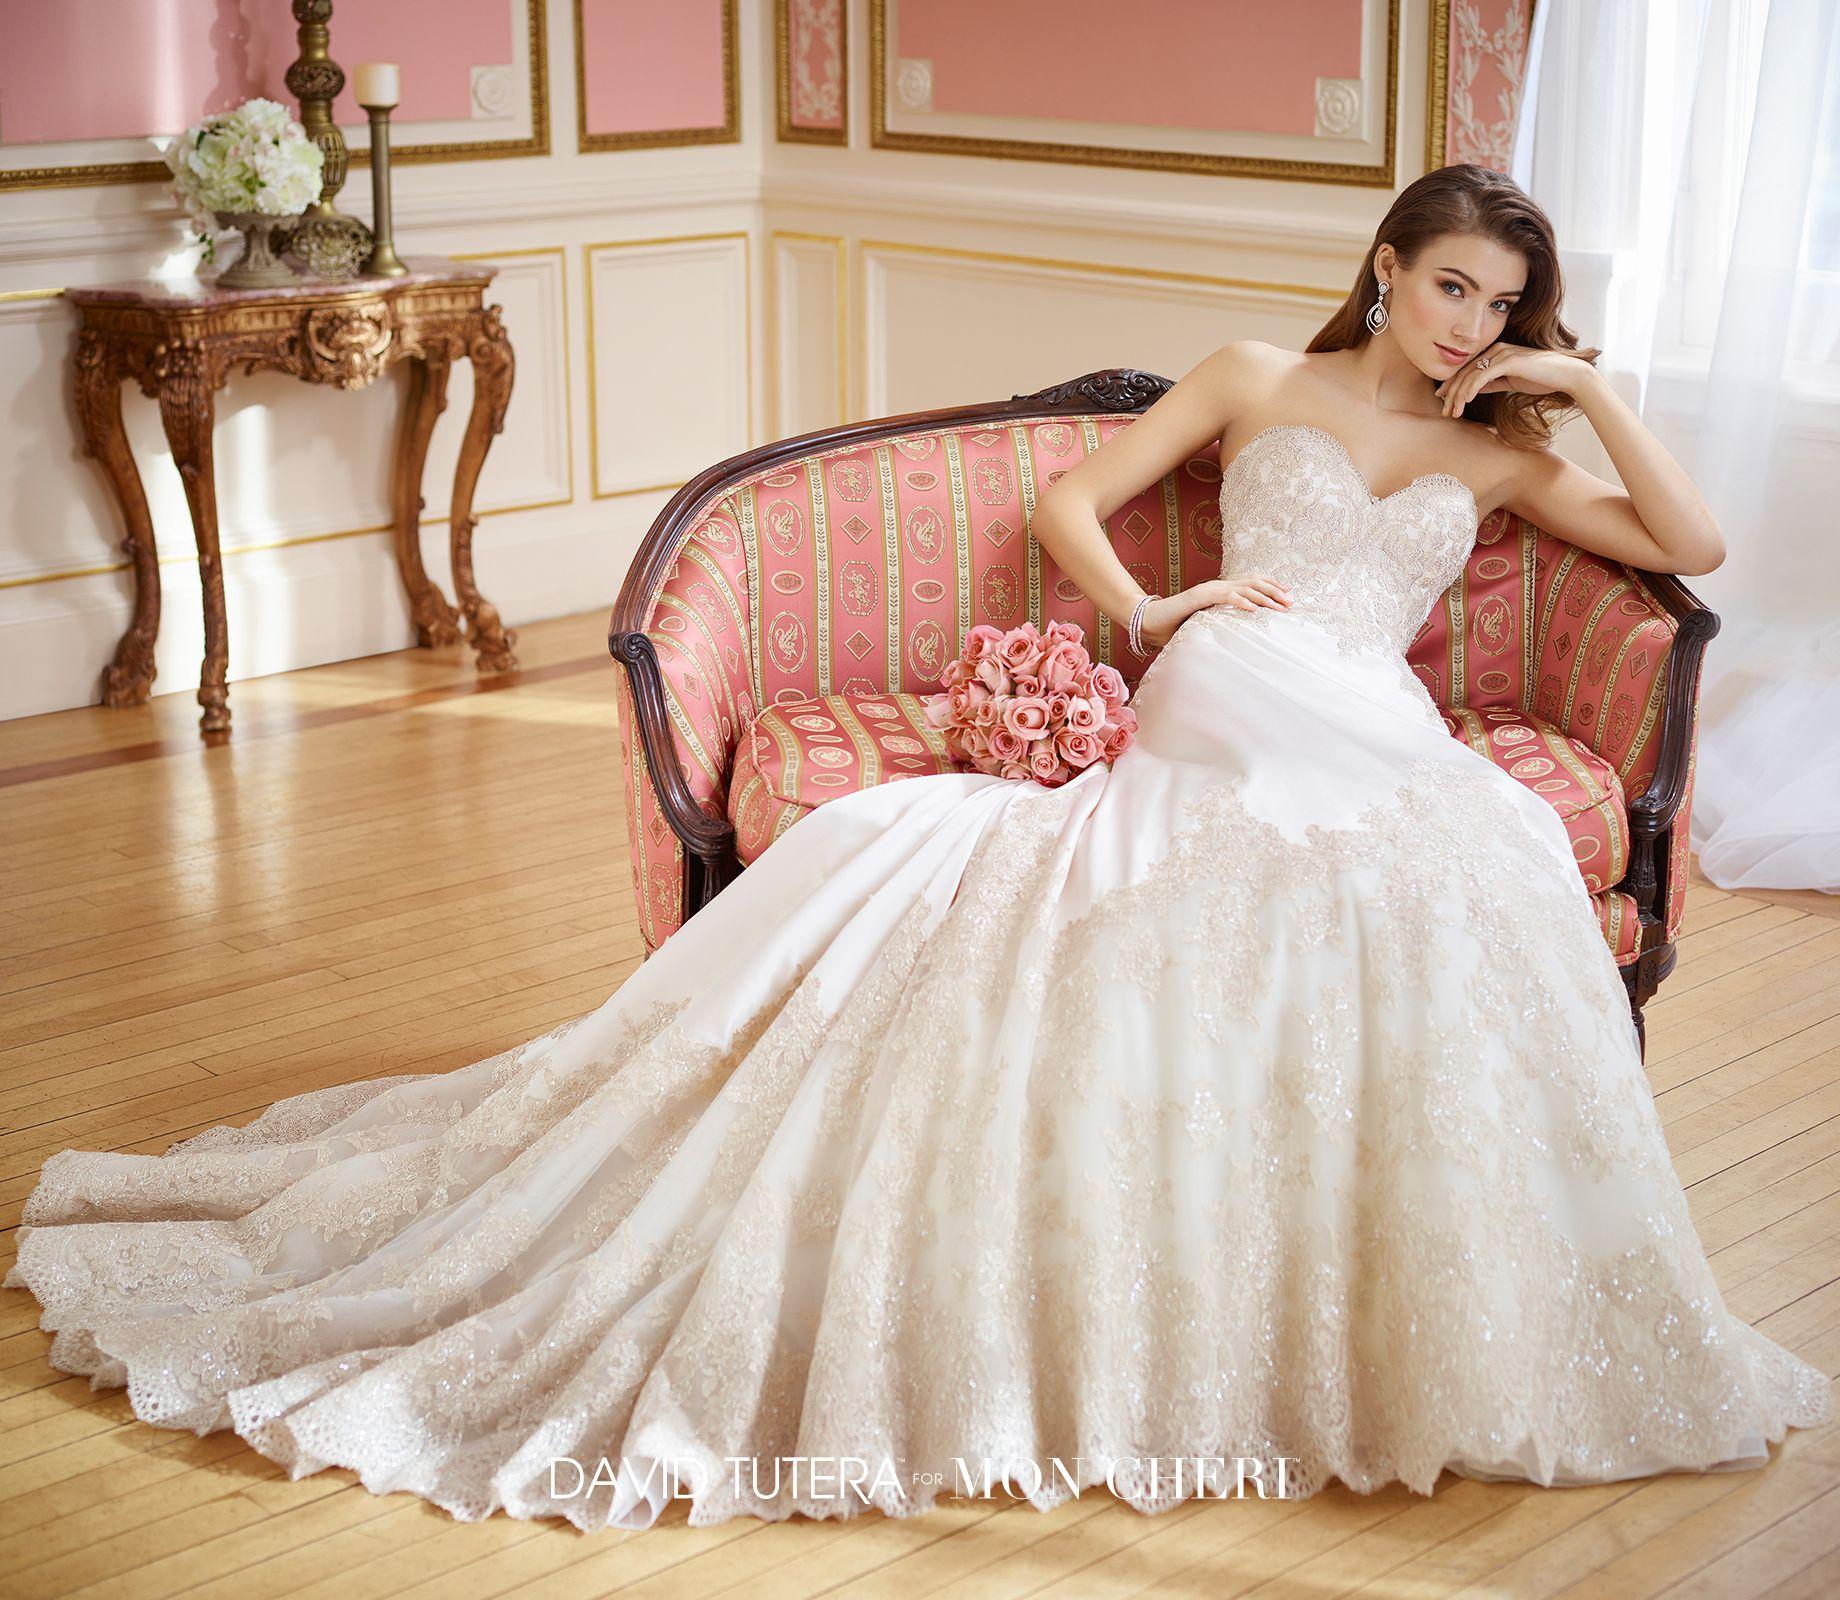 Metallic wedding dress  Strapless satin and metallic lace Aline wedding dress   Emil